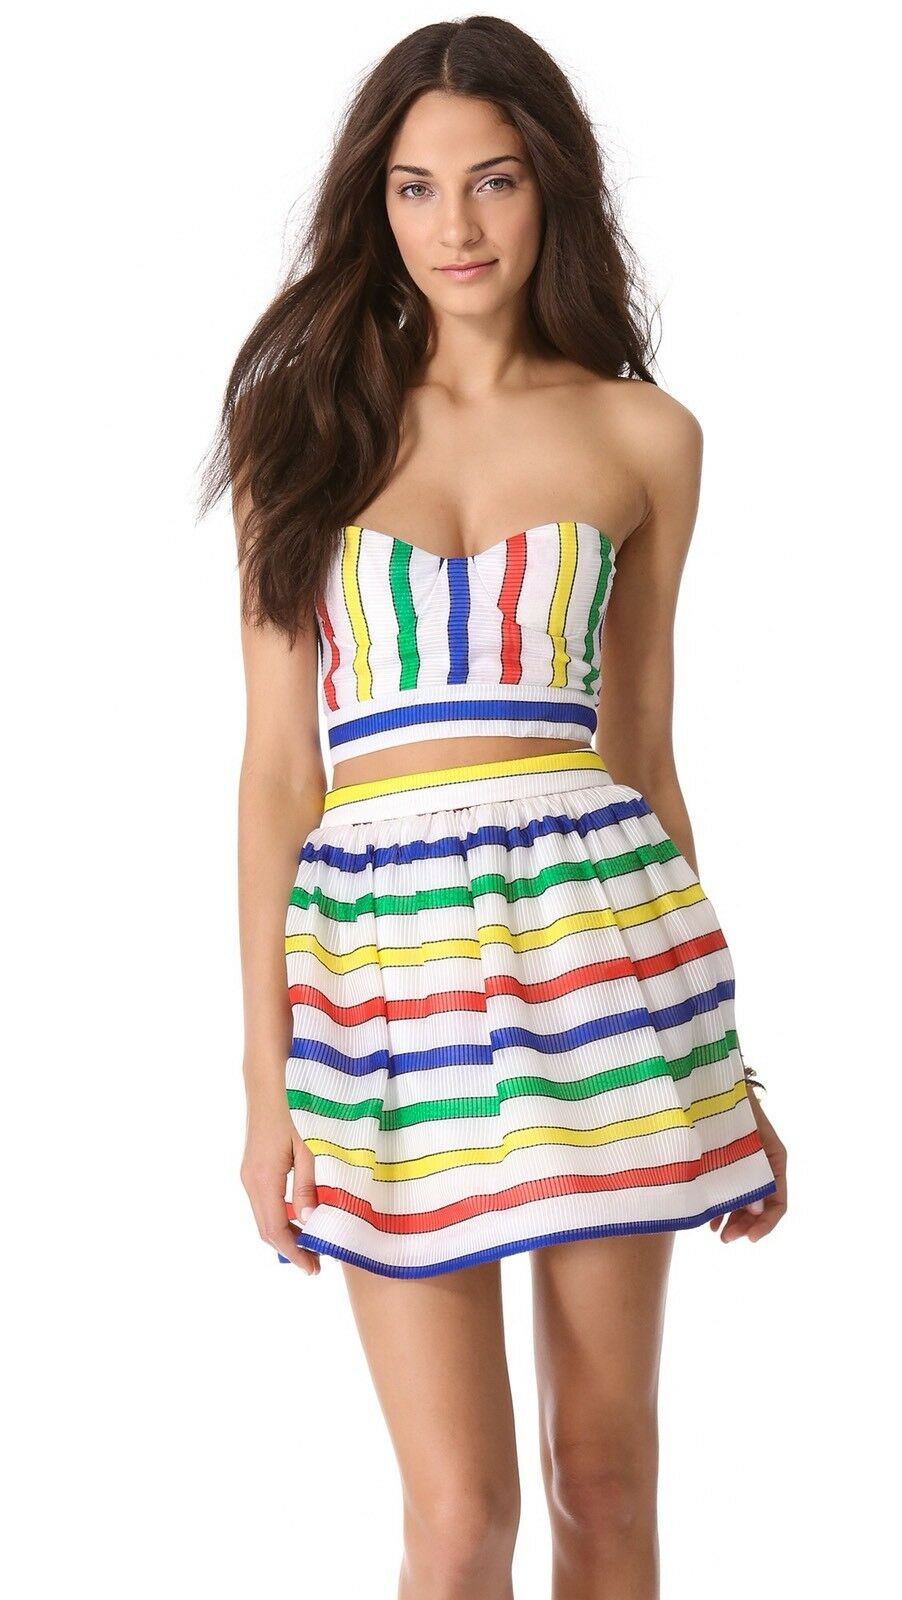 Alice + Olivia Zora Striped Bustier Bra Top & Maryna Skirt Set Größe 0 2 NWOT